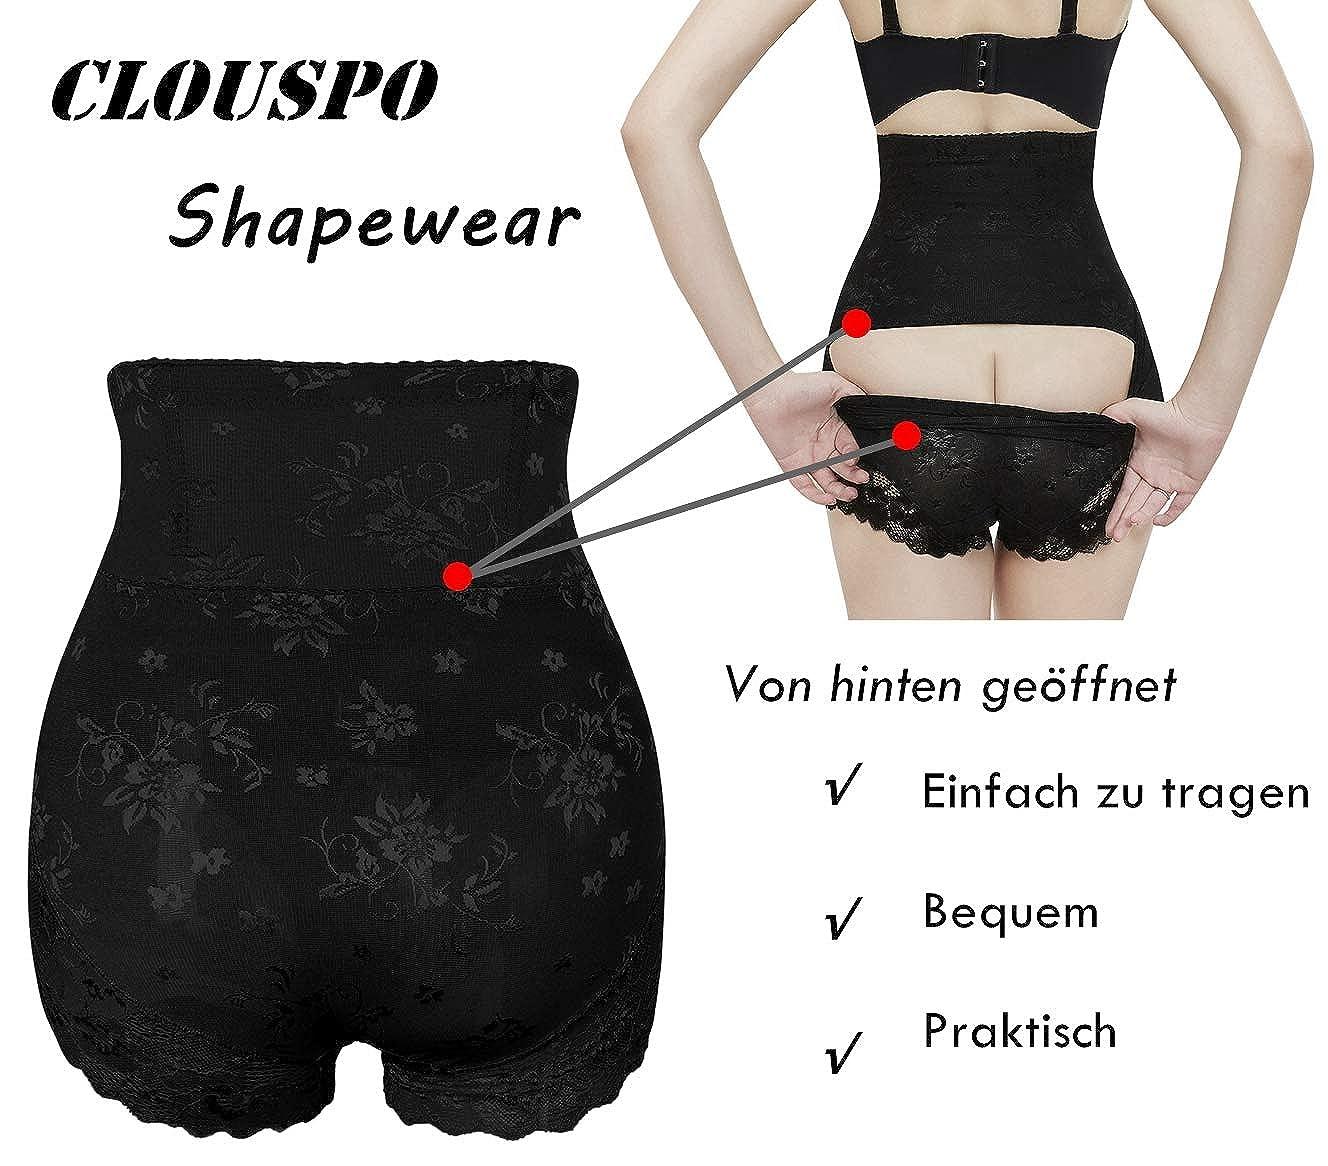 CLOUSPO Damen Shapewear Figurformender Bauch Weg Miederhosen Offene Unterw/äsche Miederslips